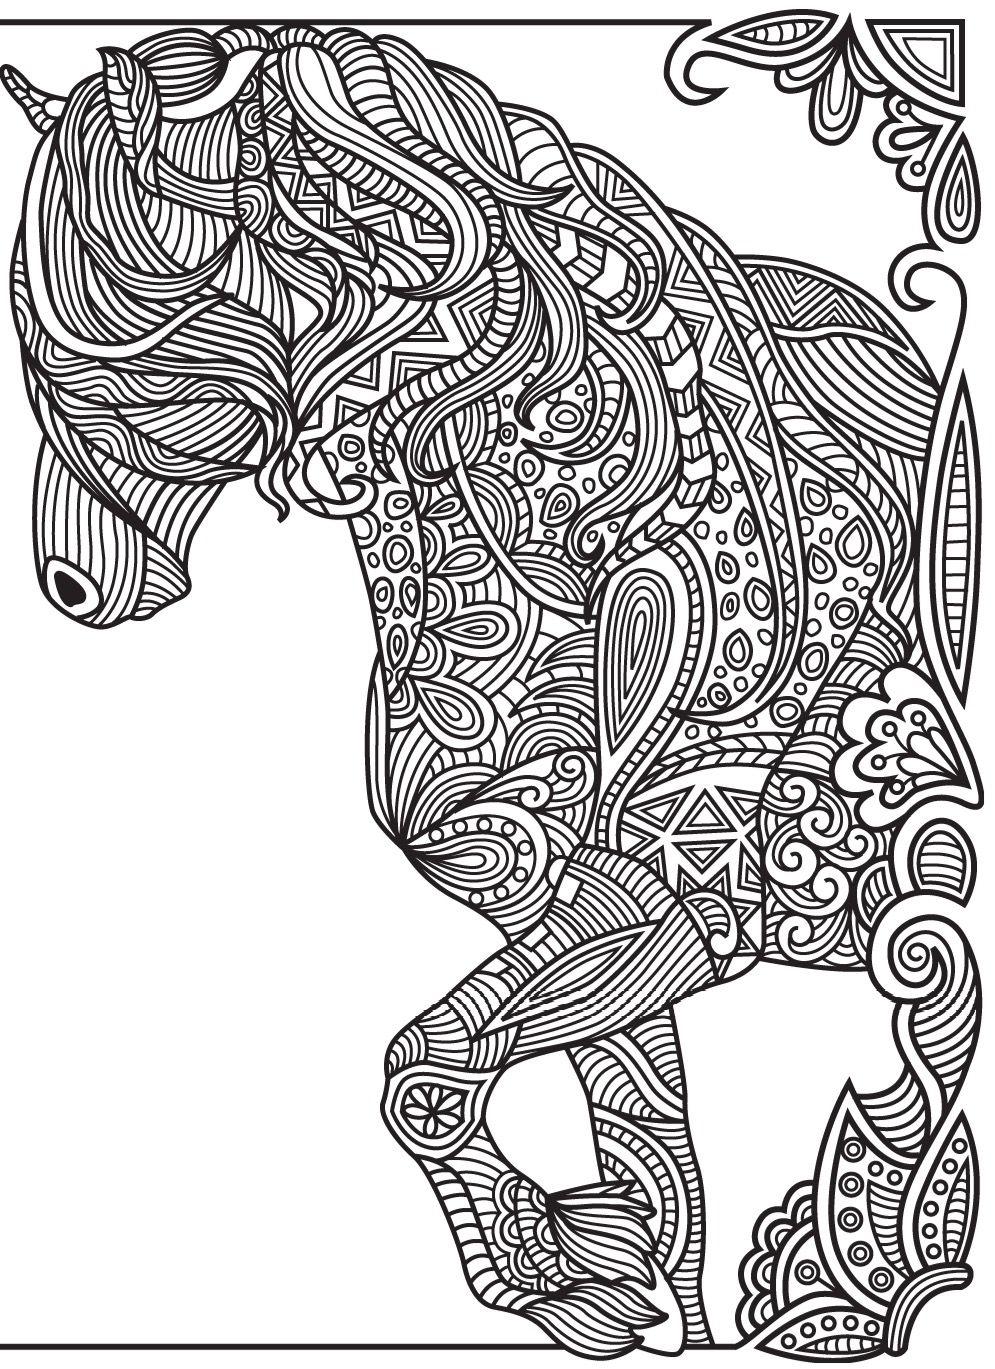 Horses Colorish Coloring Book App For Adults Mandala Relax By